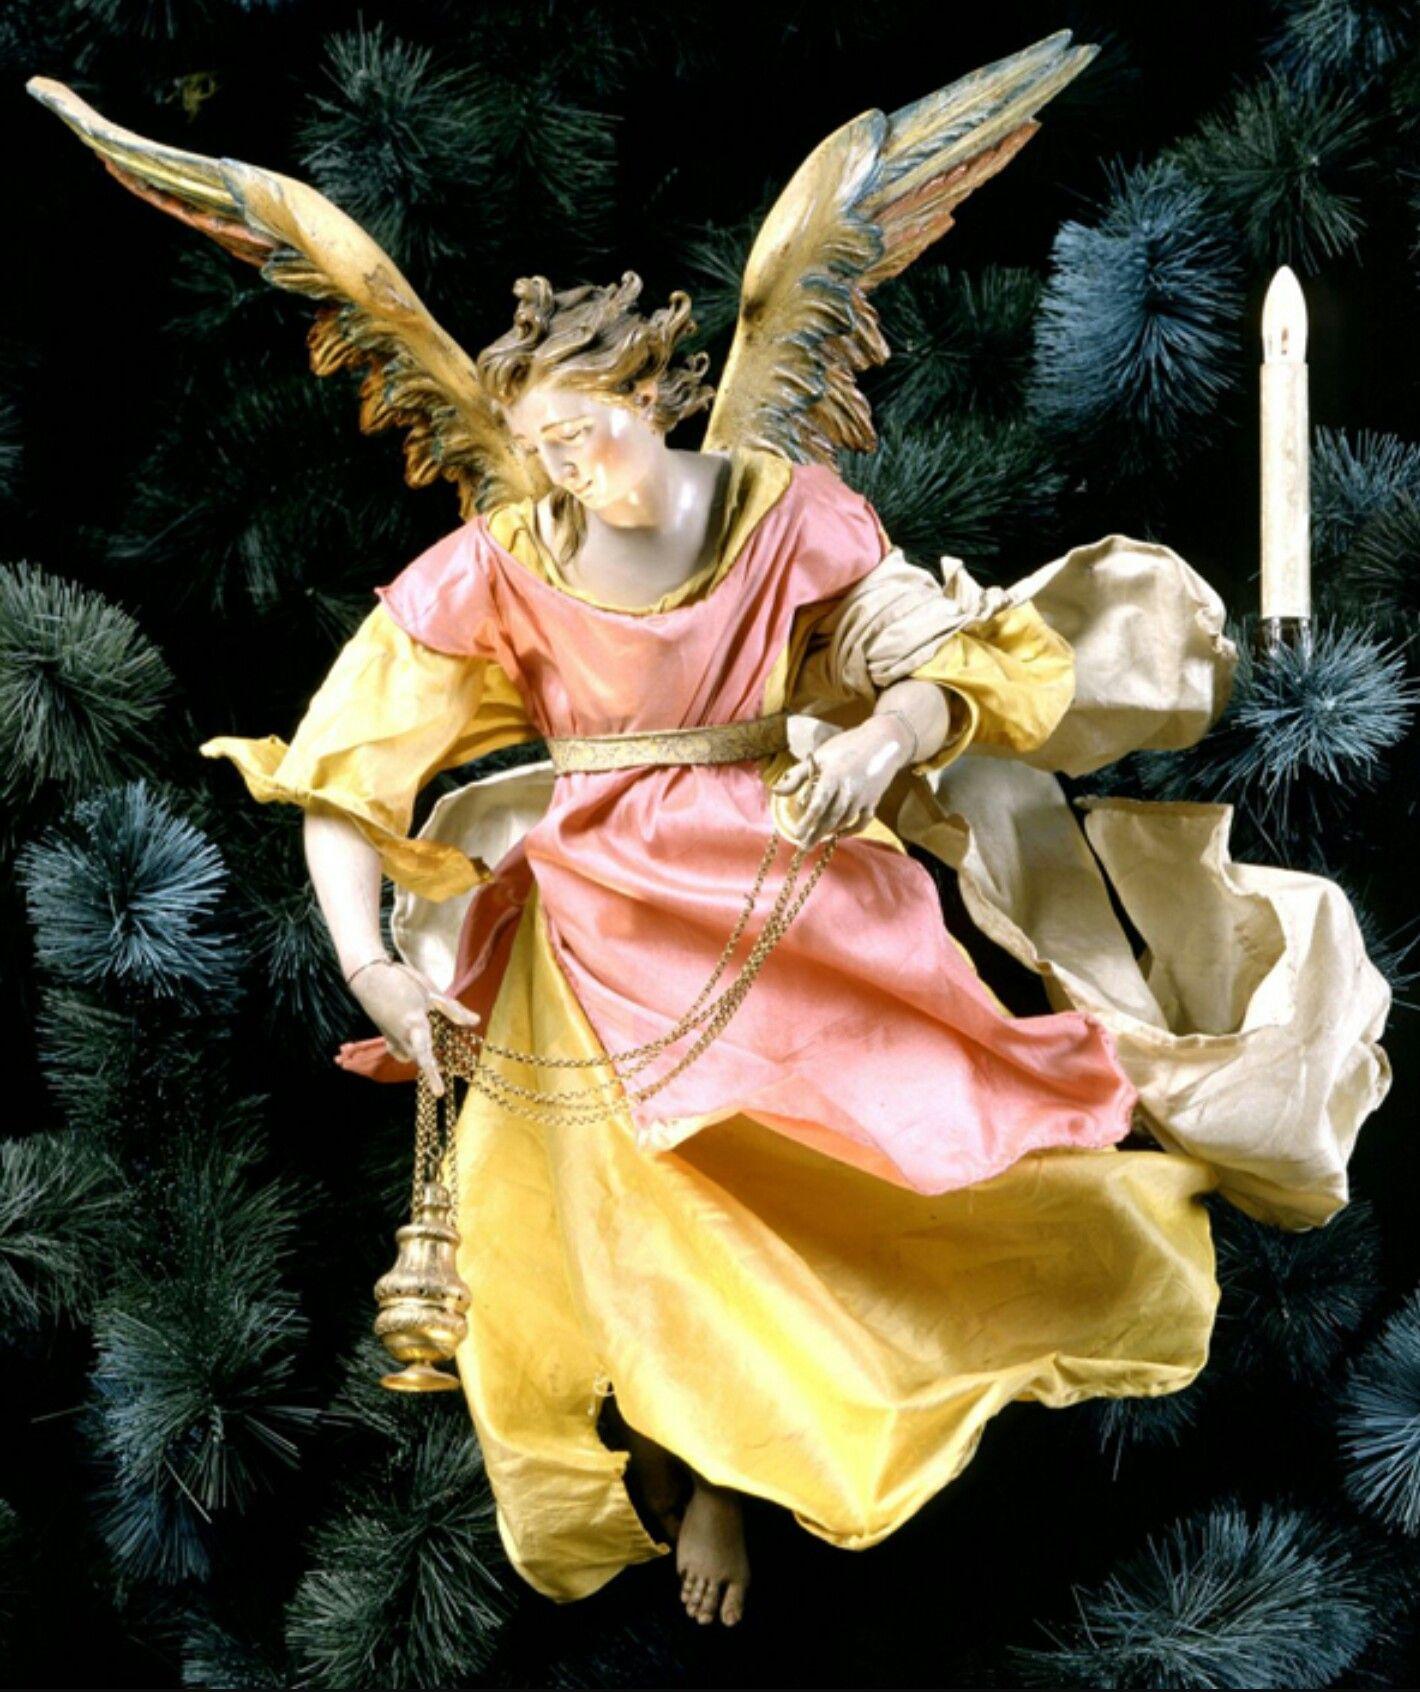 Pin de Suzanne Barnes Engemann en Celebrations•Christmas